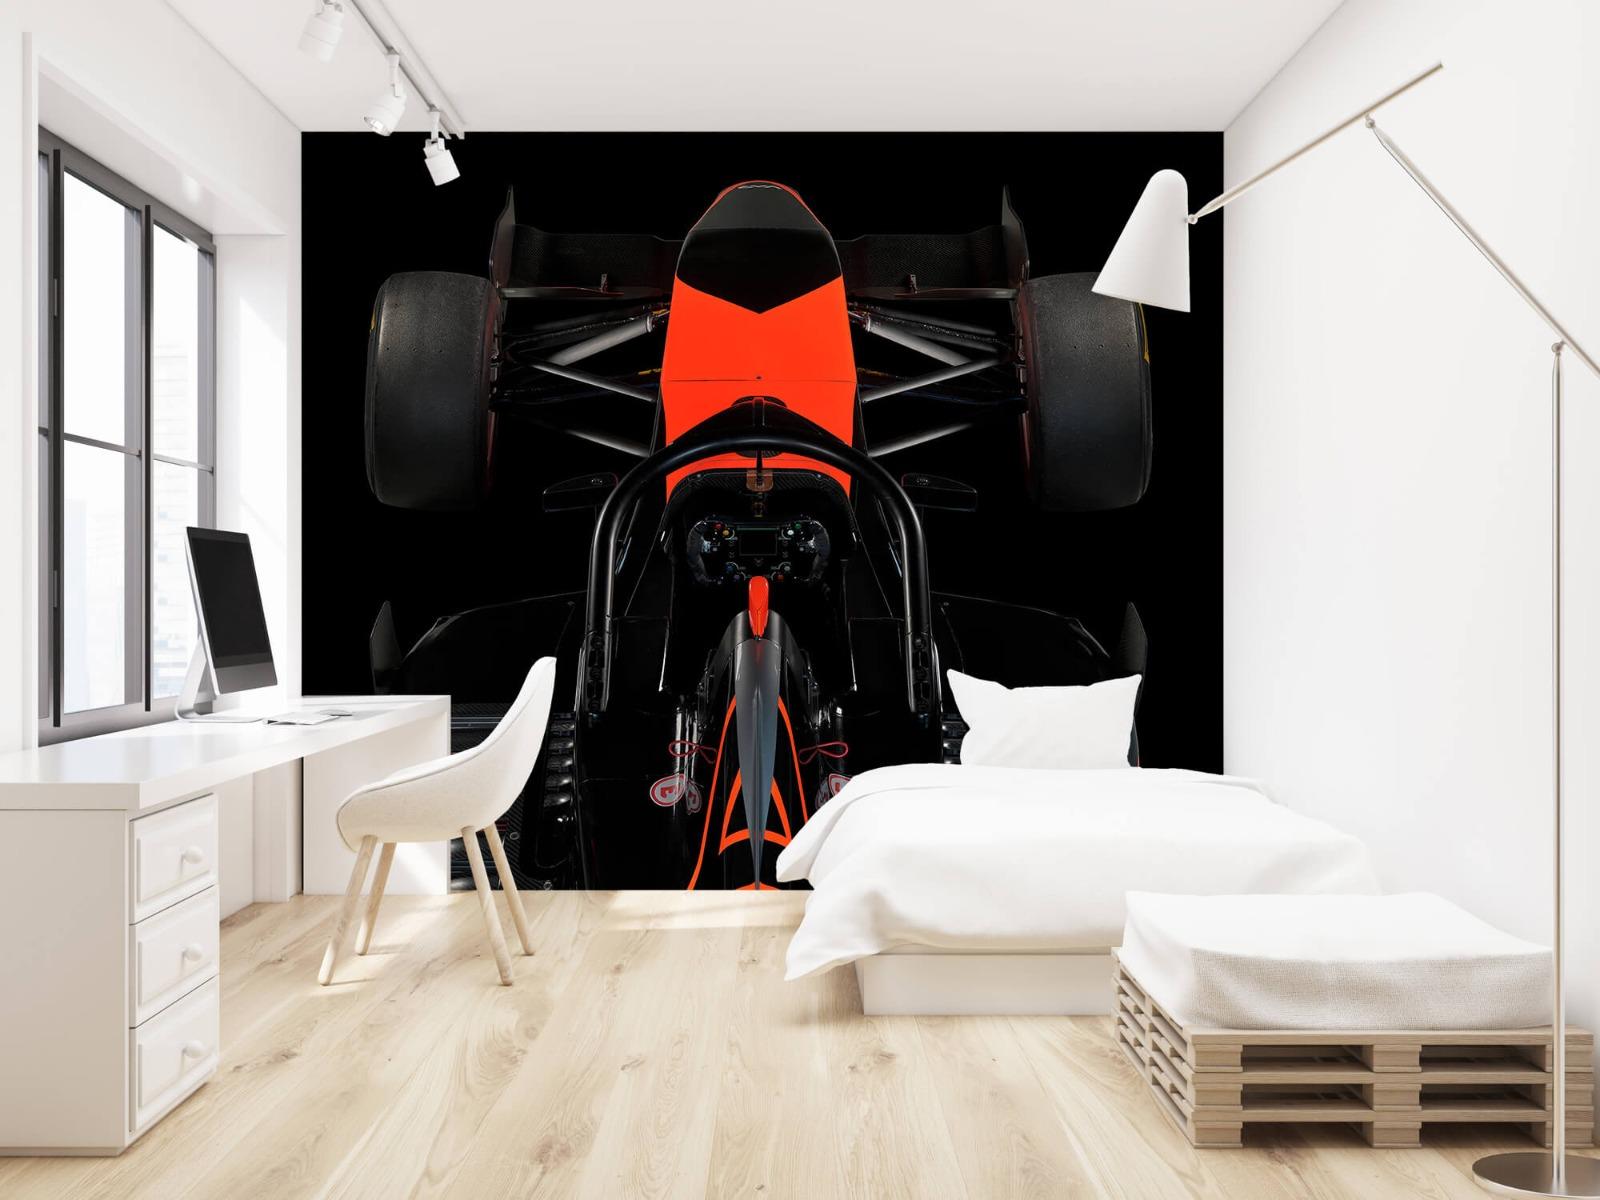 Sportauto's - Formule 3 - Cockpit view - dark - Tienerkamer 22